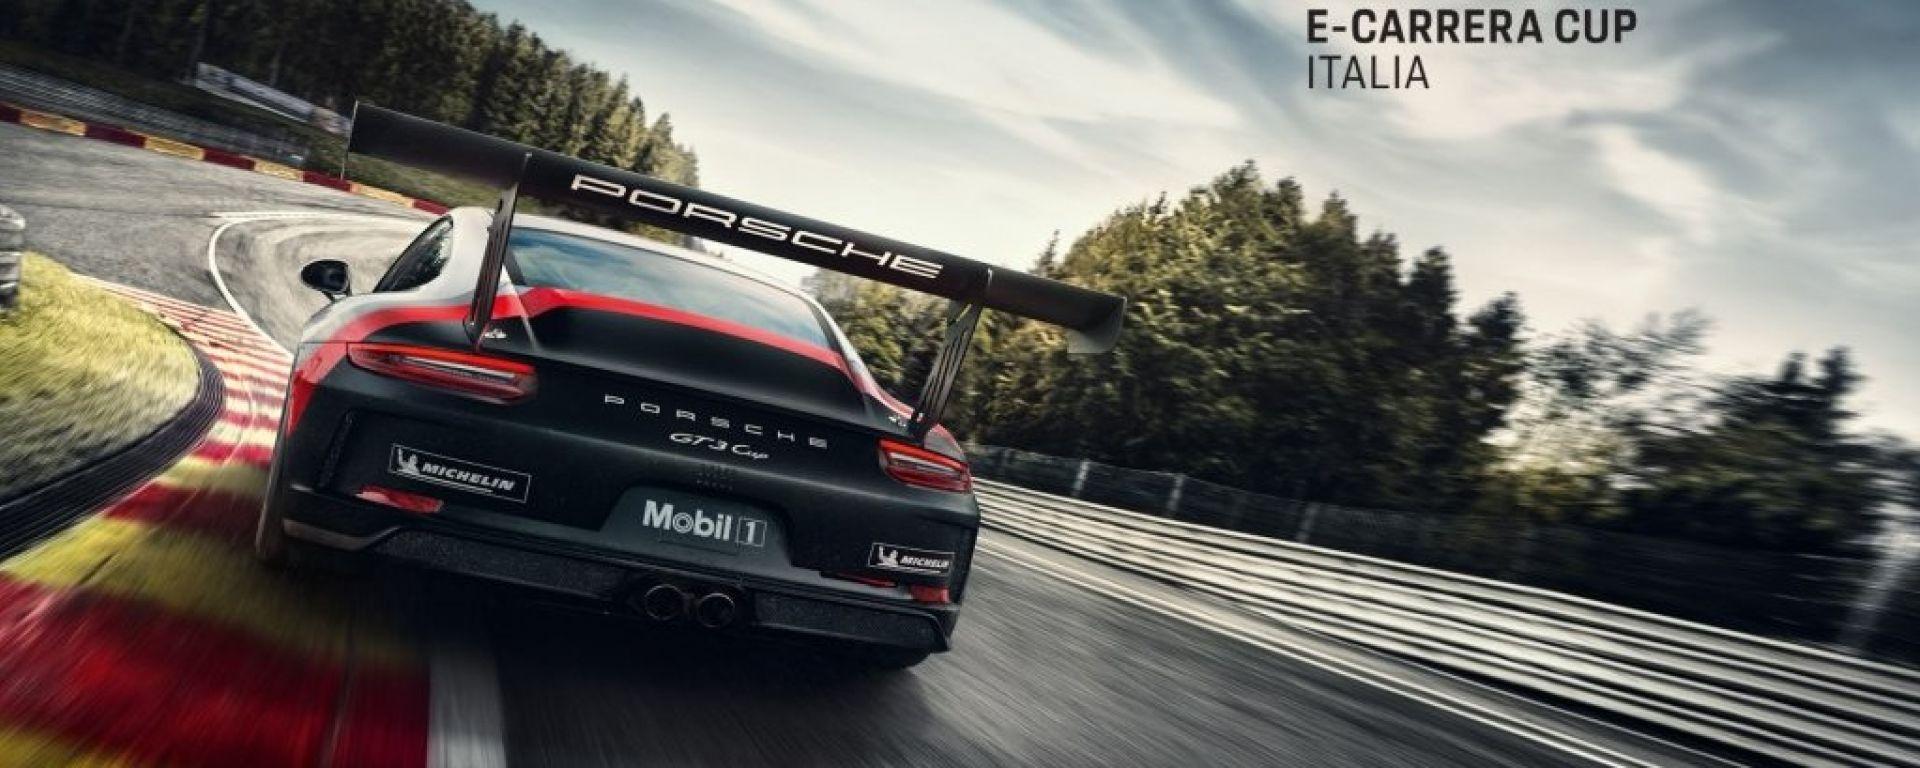 Porsche eCarrera Cup Italia